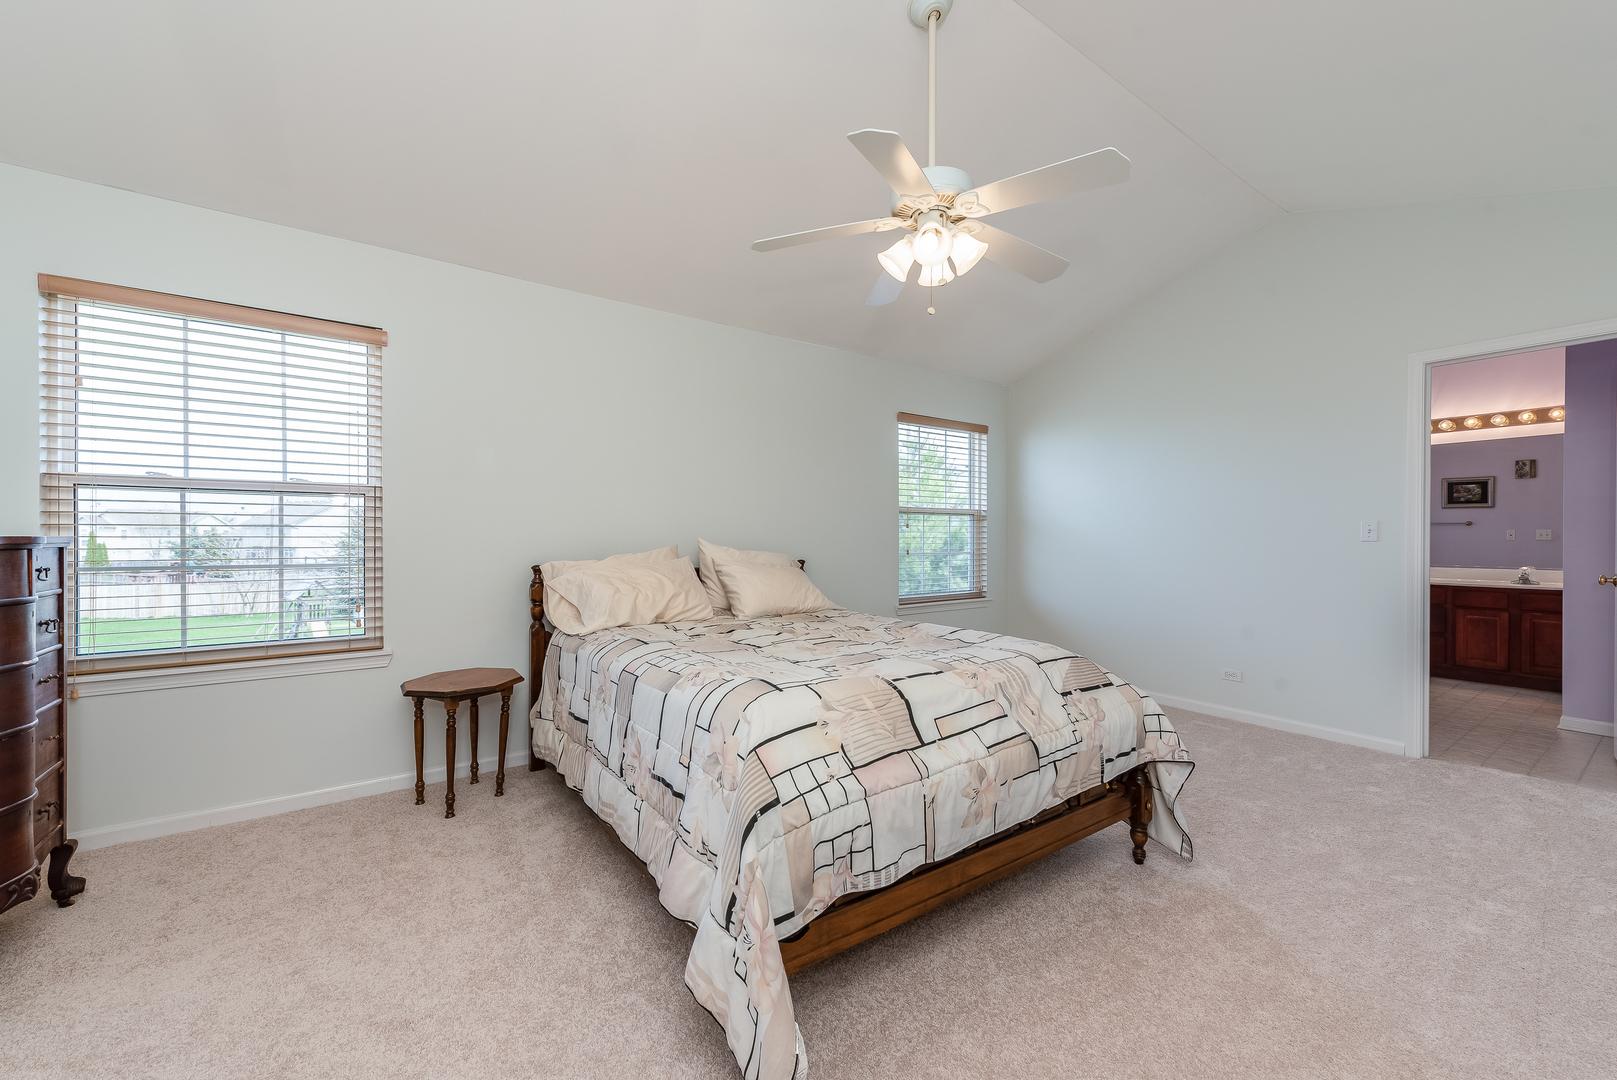 2680 Tiffany, AURORA, Illinois, 60503